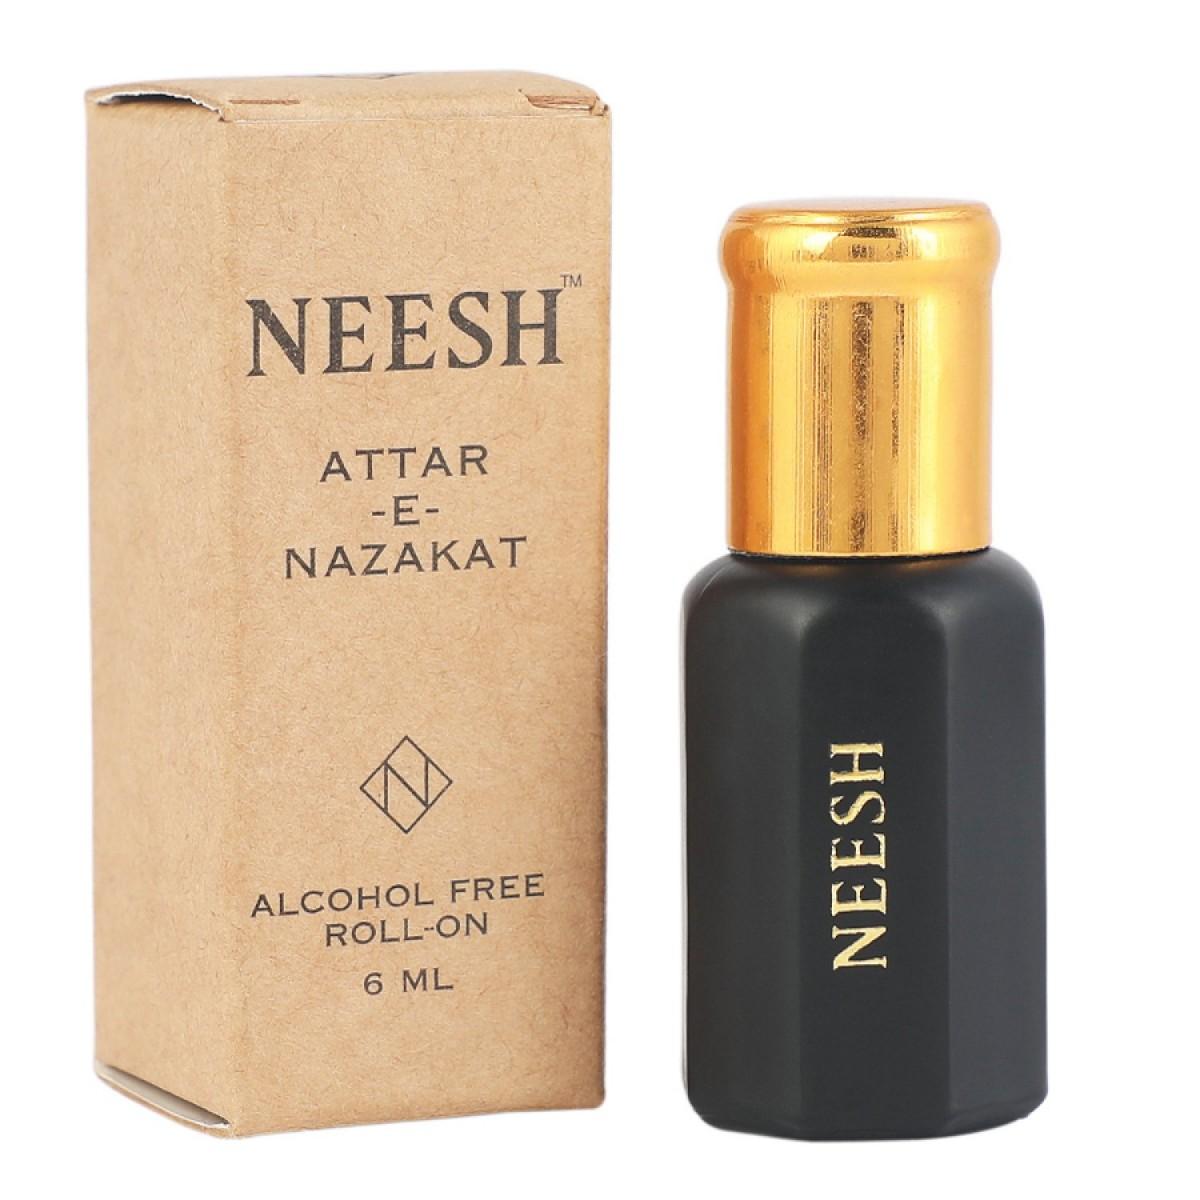 Hinduskie perfumy w olejku typu roll on Attar-e-Nazakat